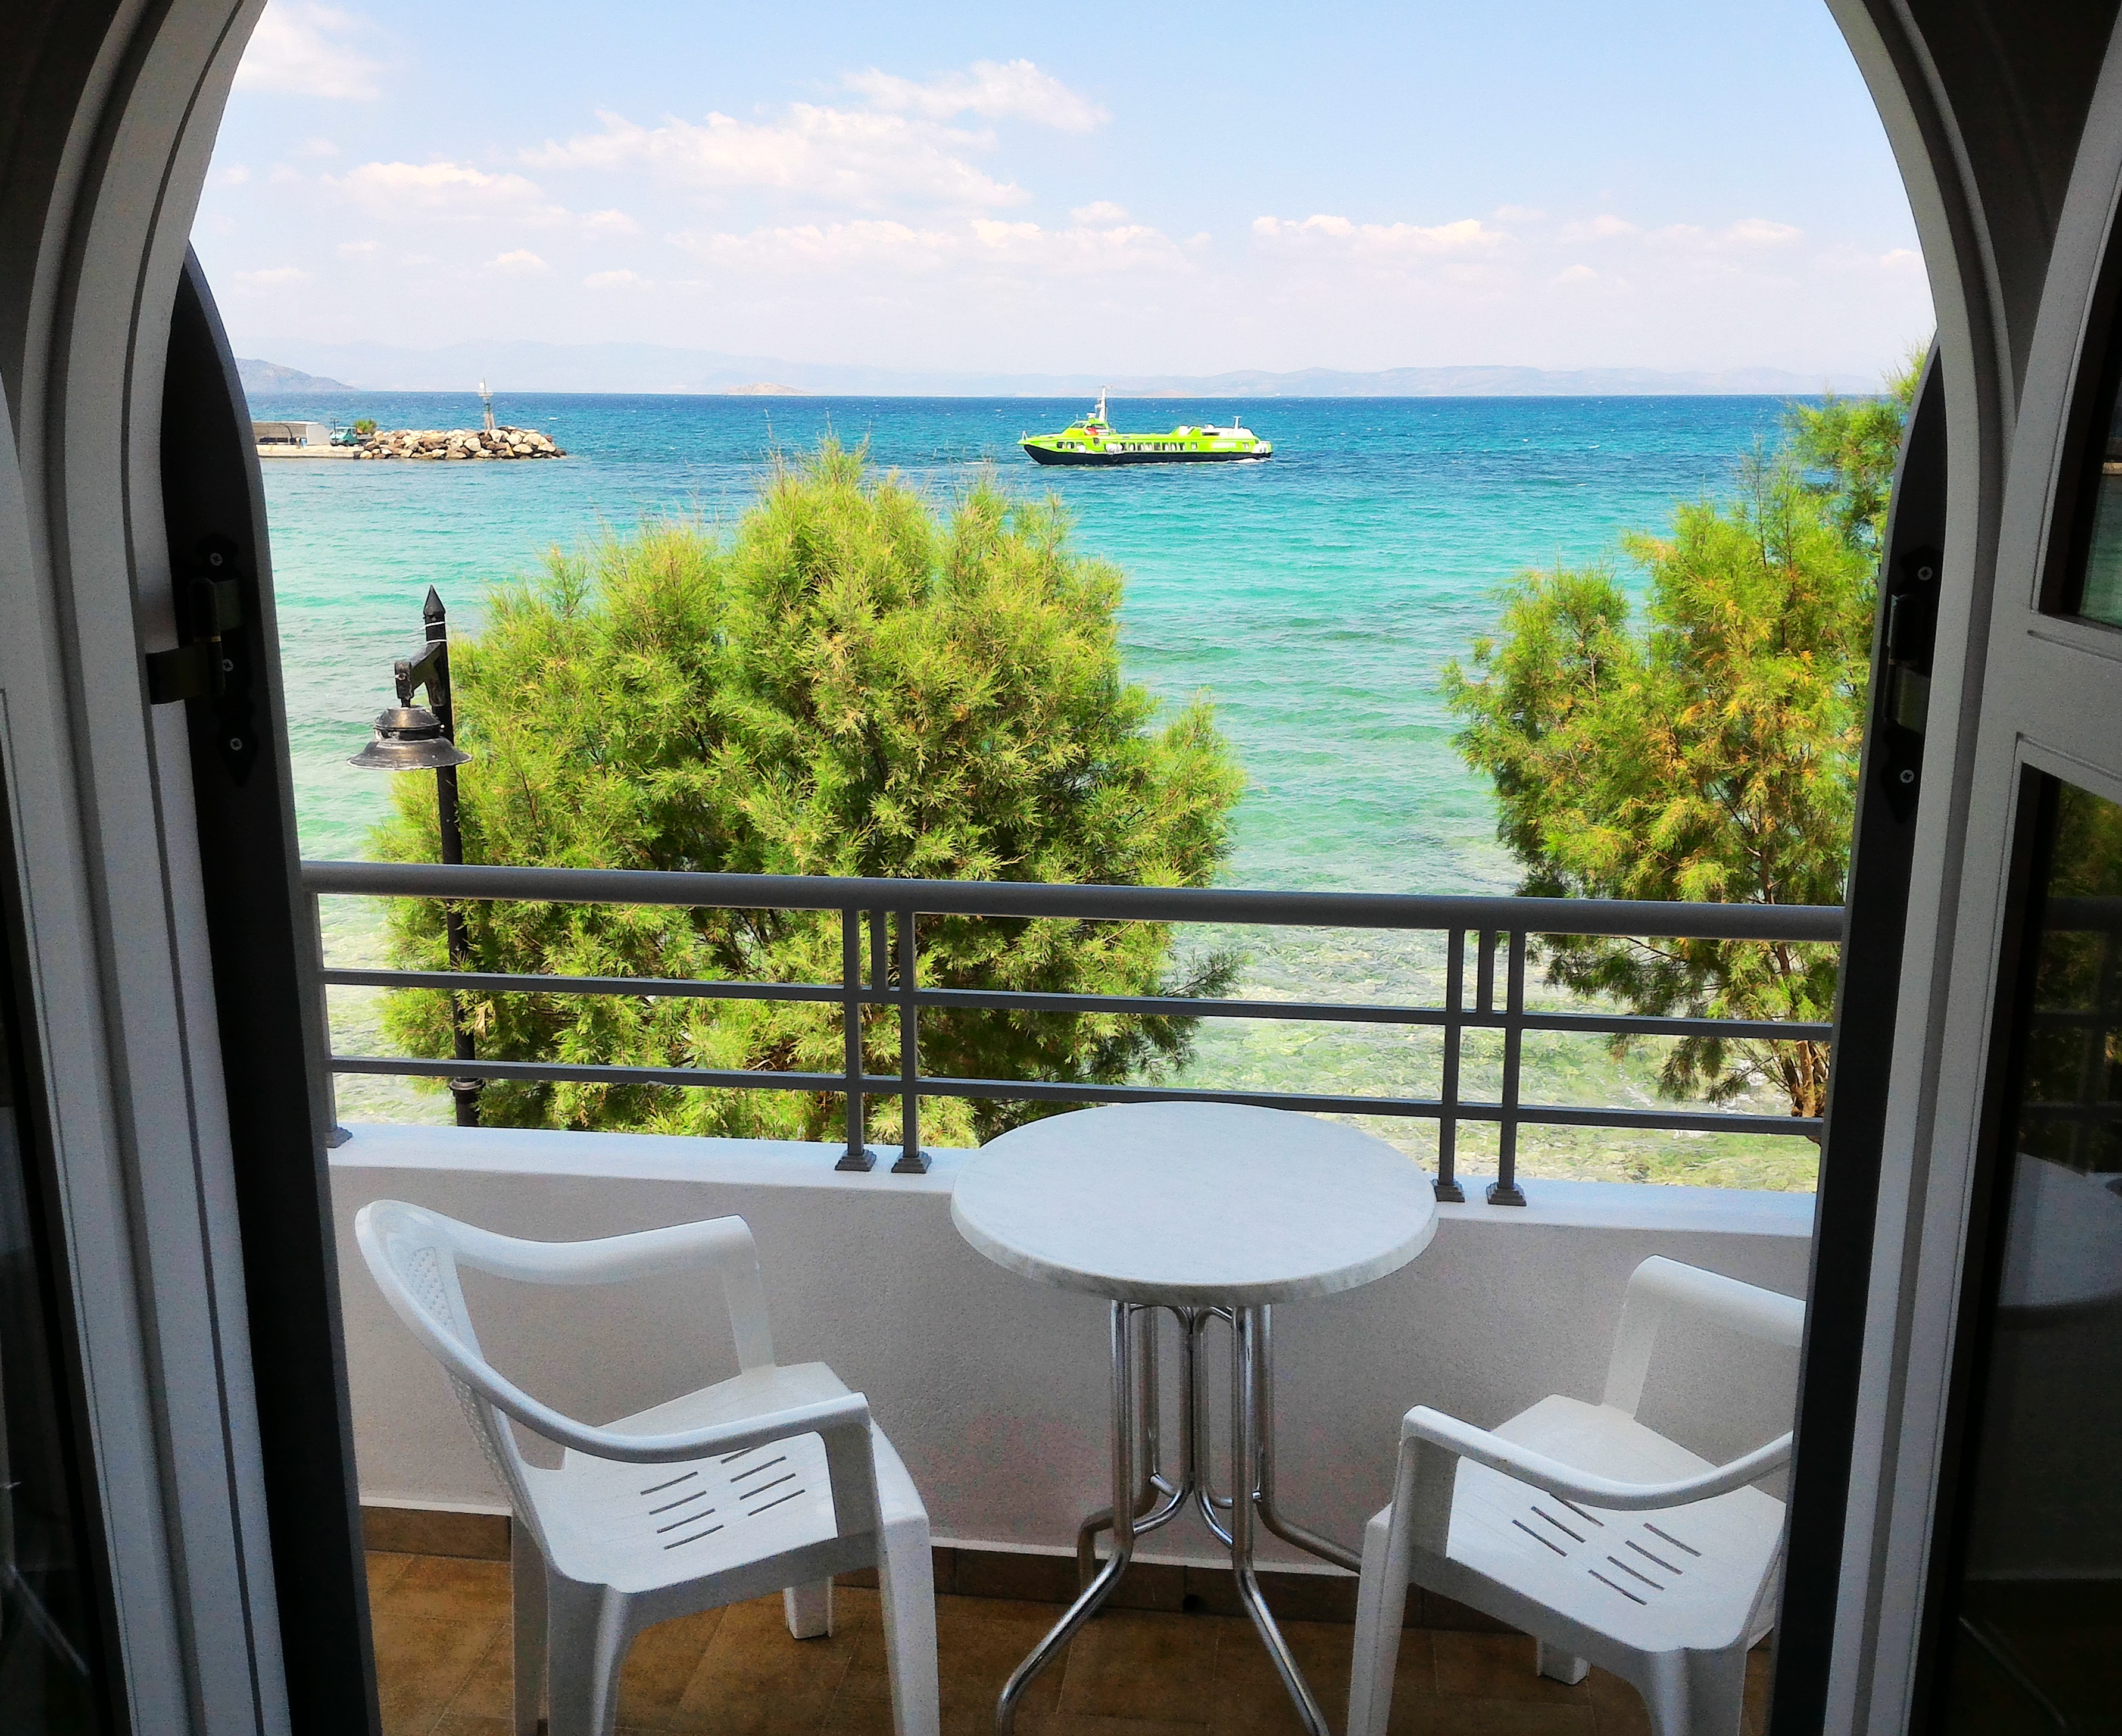 Nontas hotel, Agistri island